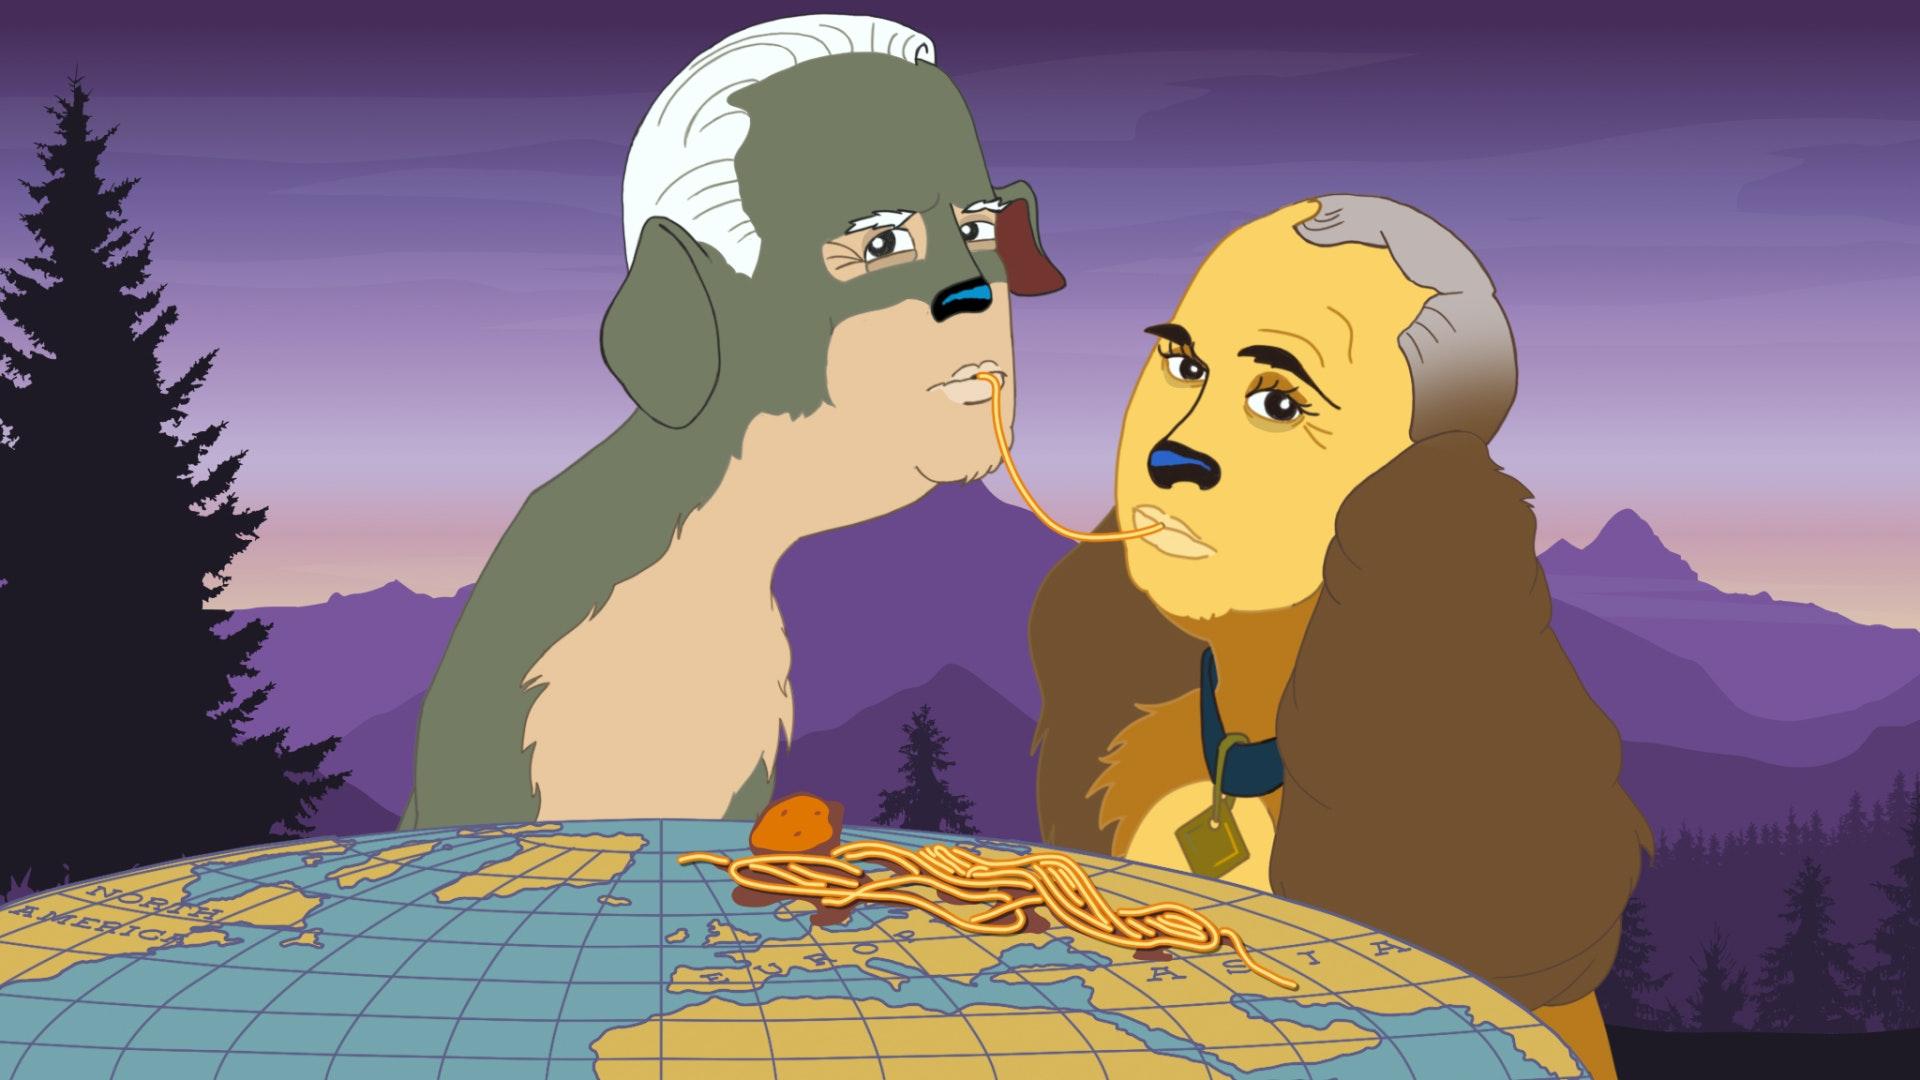 Ep. 1276 - Joe And Vladimir: A Love Story